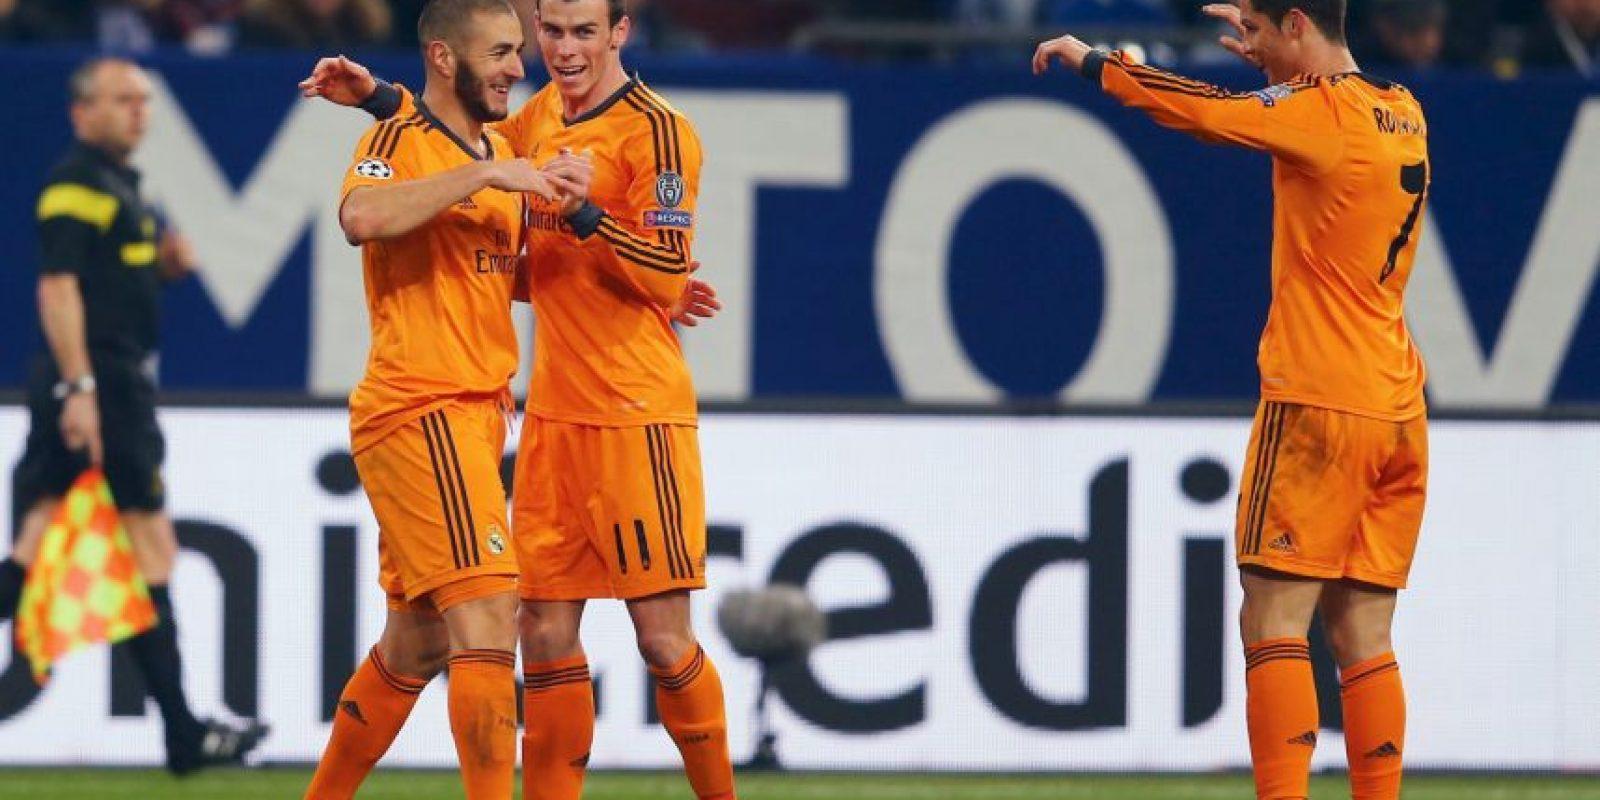 2. Benzema – Bale – Cristiano (Real Madrid/La Liga) Foto:Getty Images